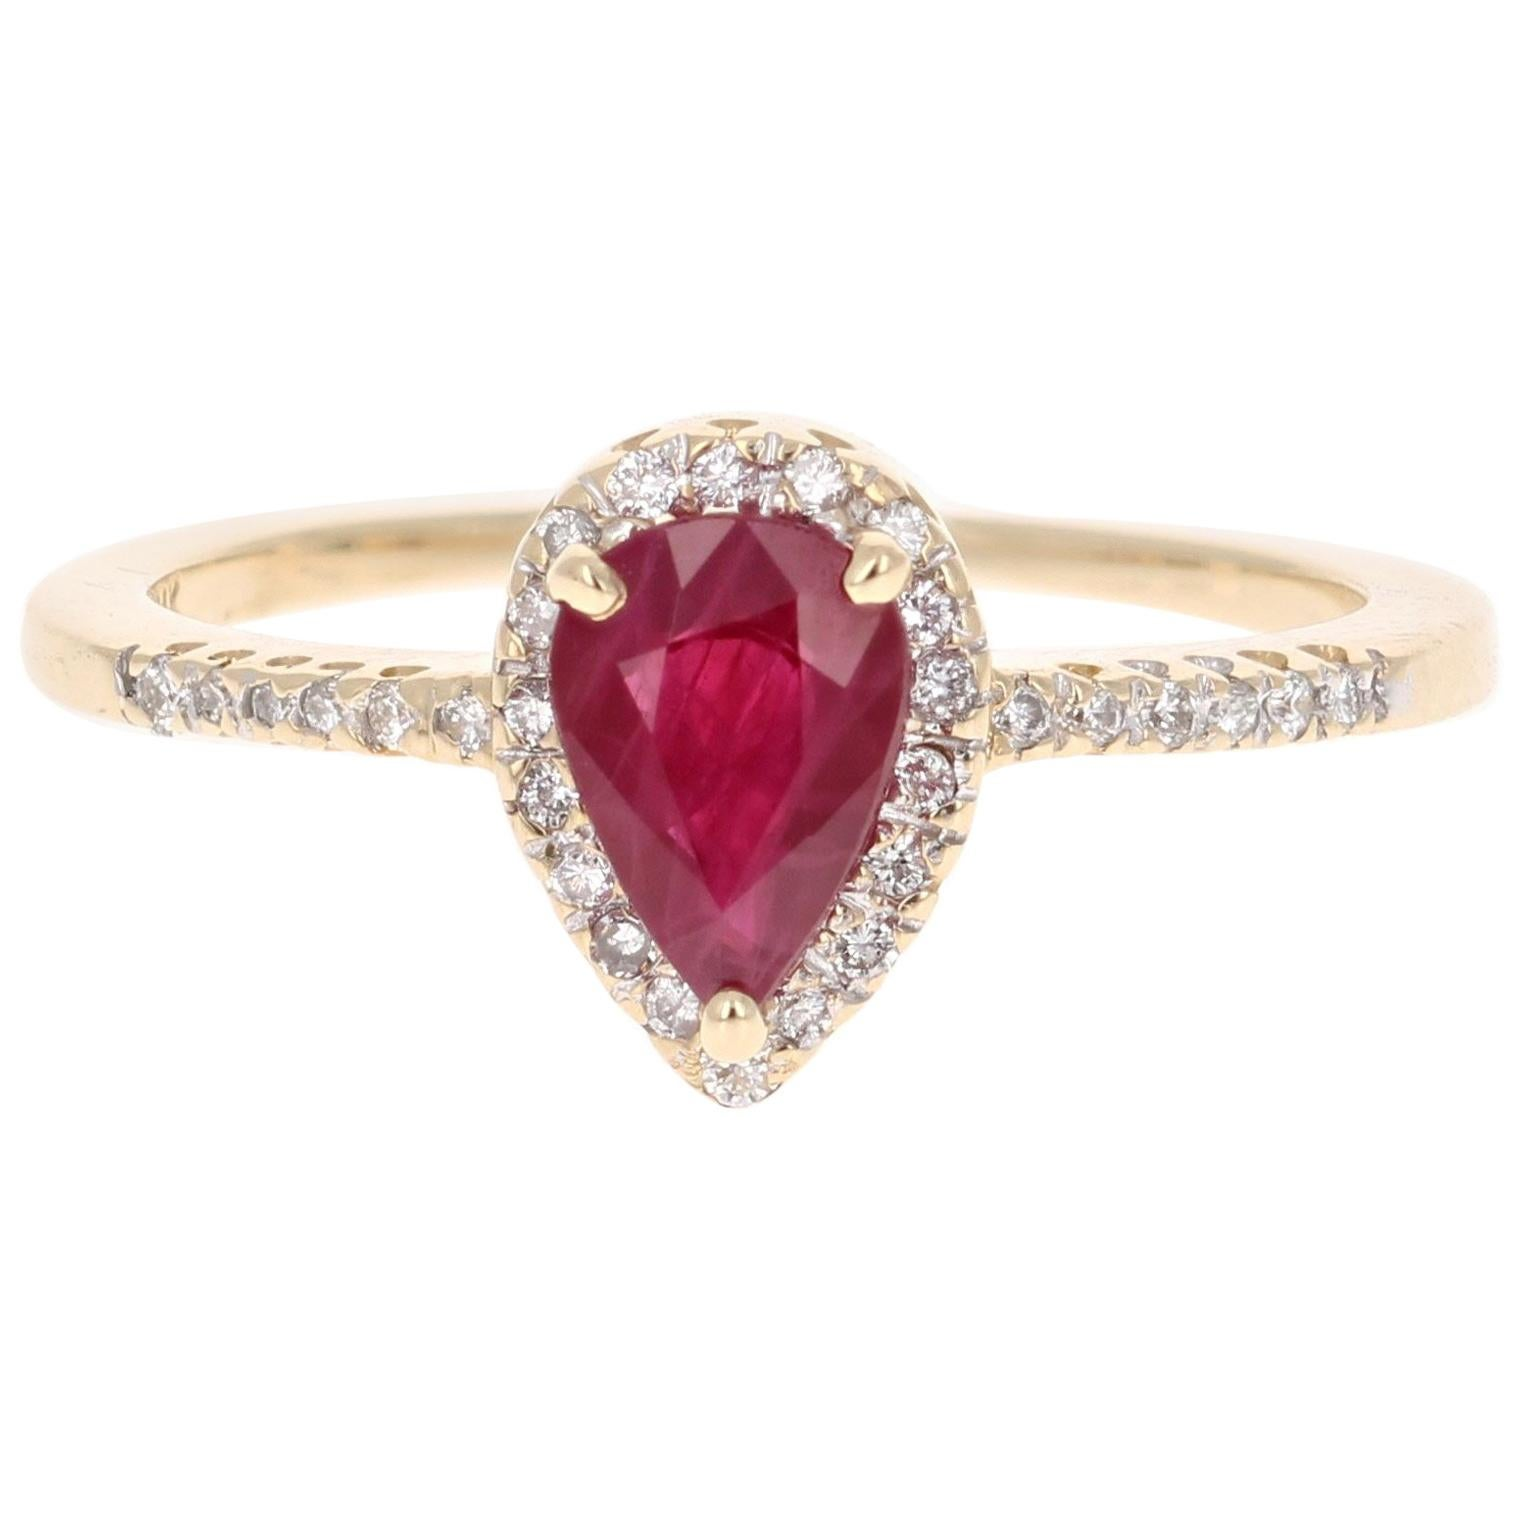 1.08 Carat Pear Cut Ruby Diamond 14 Karat Yellow Gold Bridal Ring